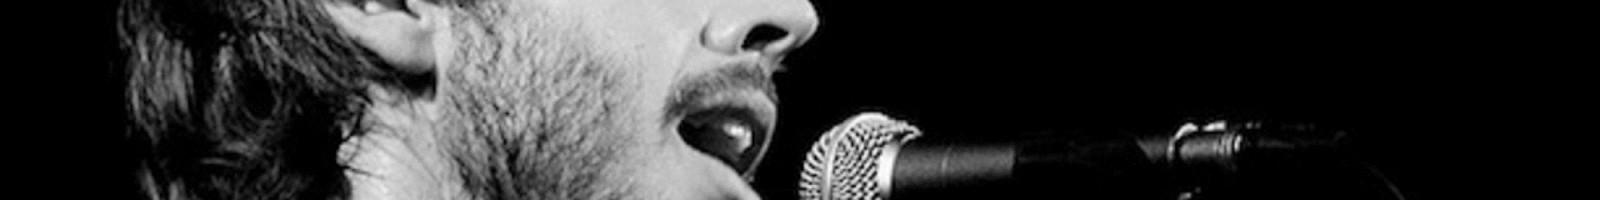 Right chord music new music blog playlists music marketing follow rcm stopboris Images